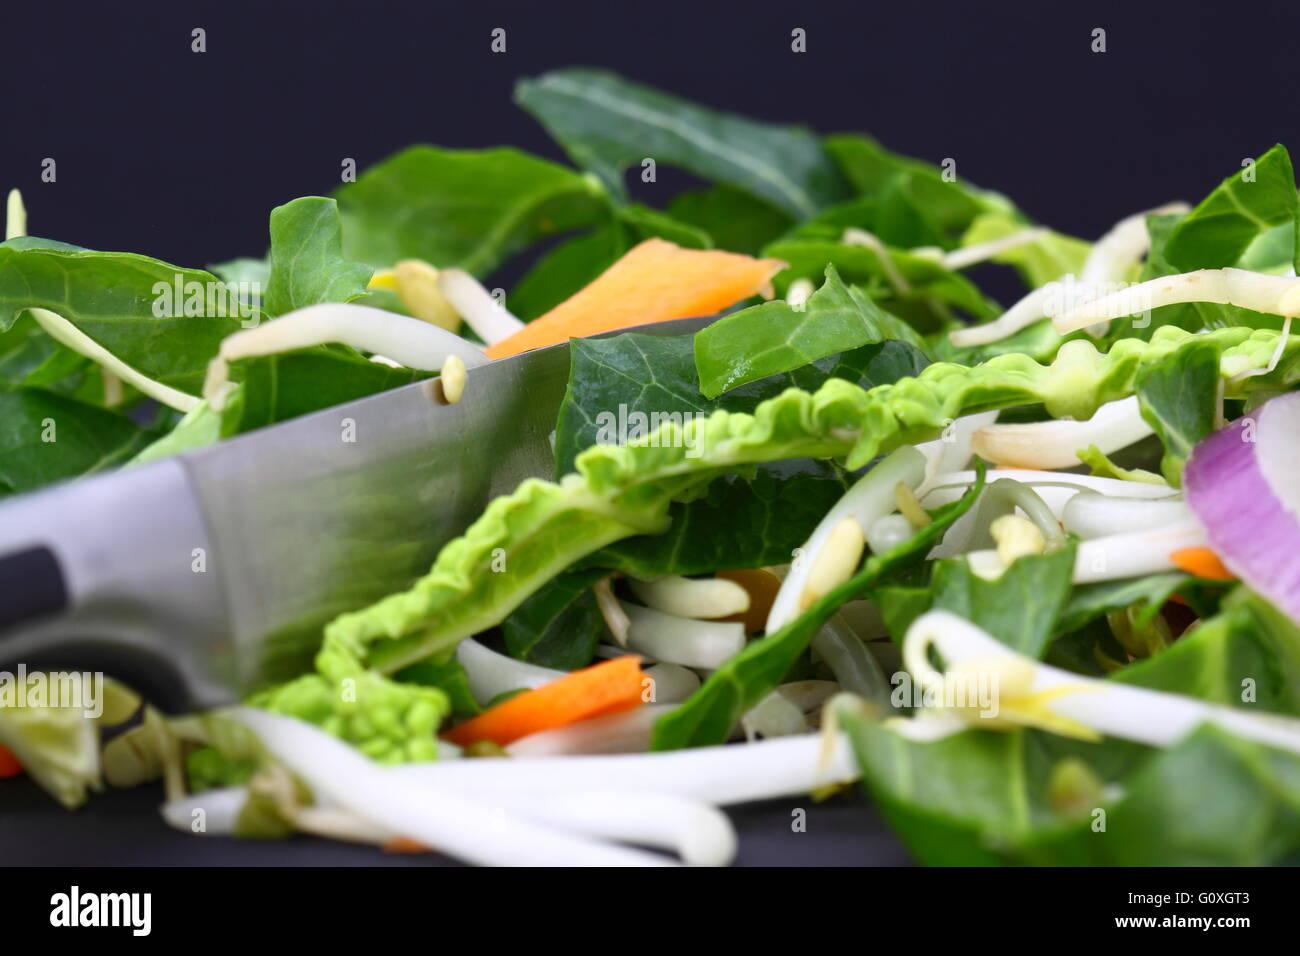 Stir Fry Cabbage Stock Photos Amp Stir Fry Cabbage Stock